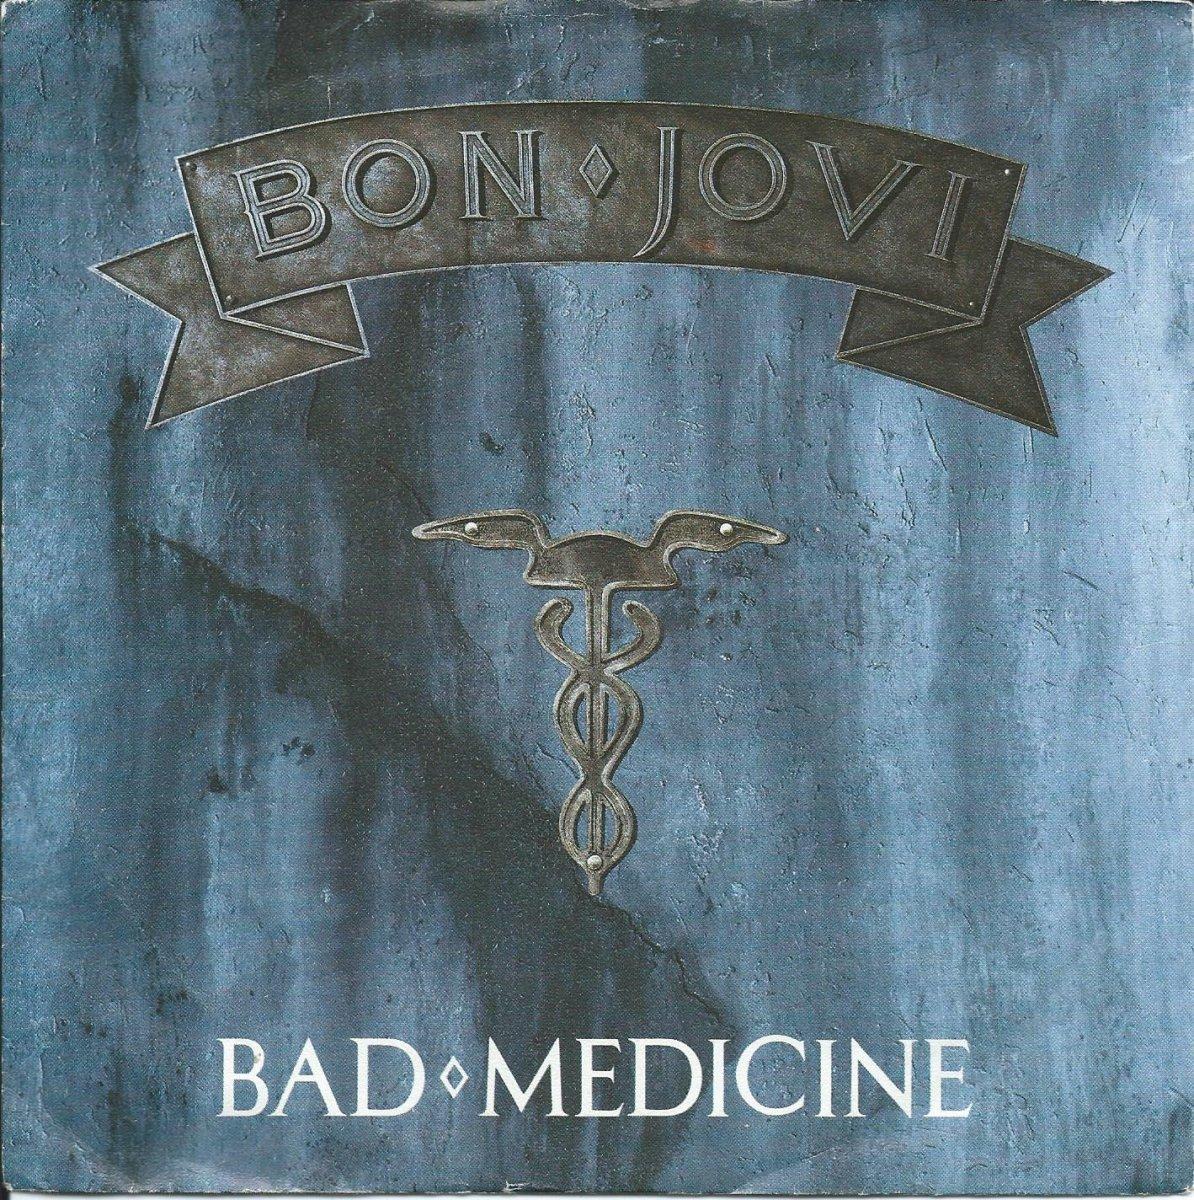 BON JOVI / BAD MEDICINE / 99 IN THE SHADE (7